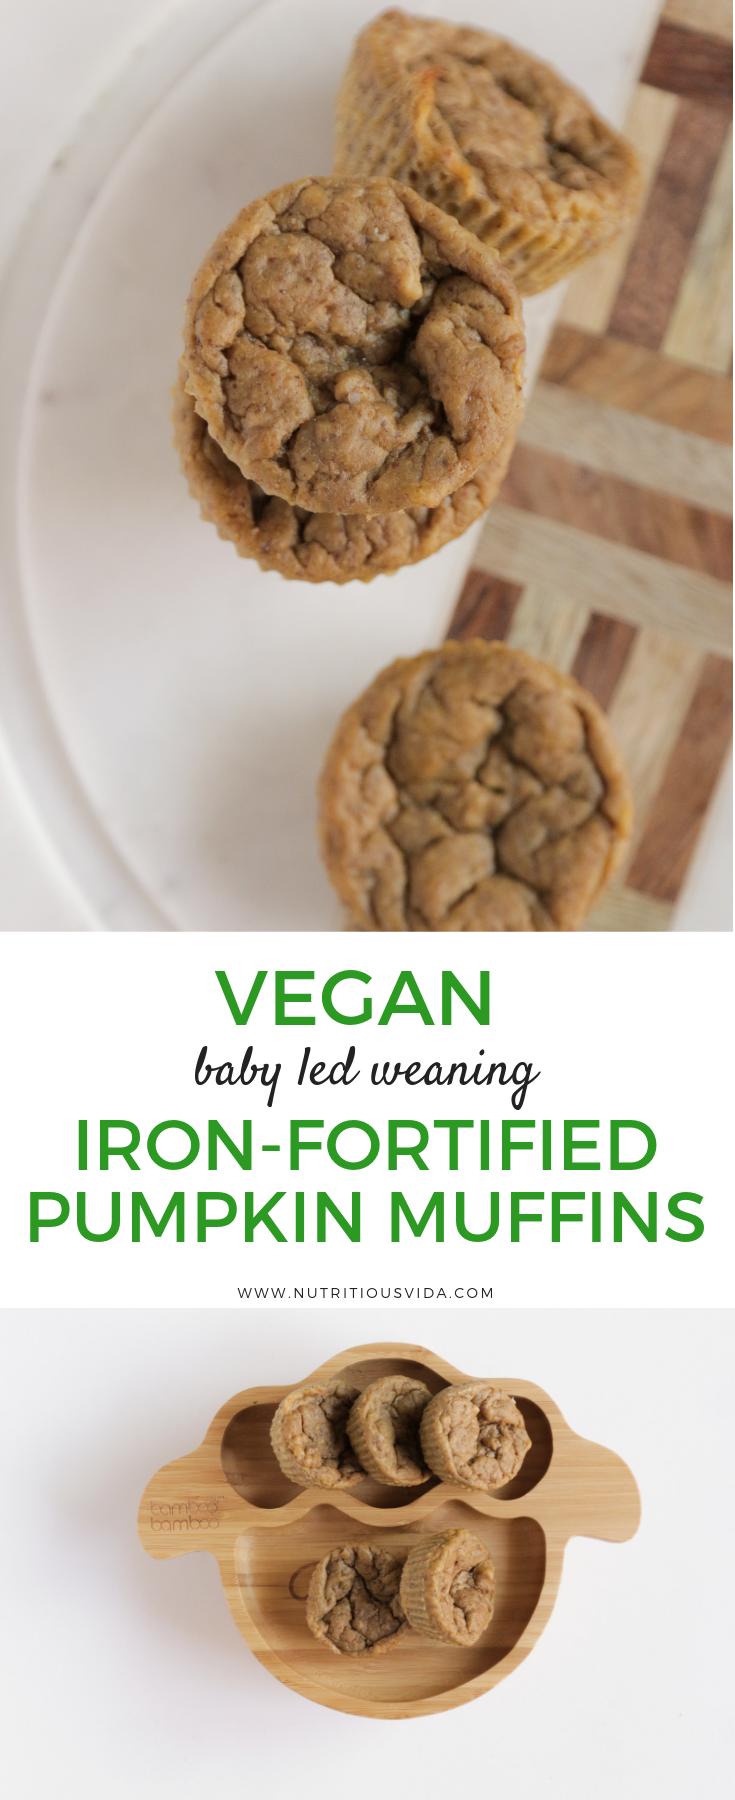 Vegan Baby Led Weaning Pumpkin Muffins